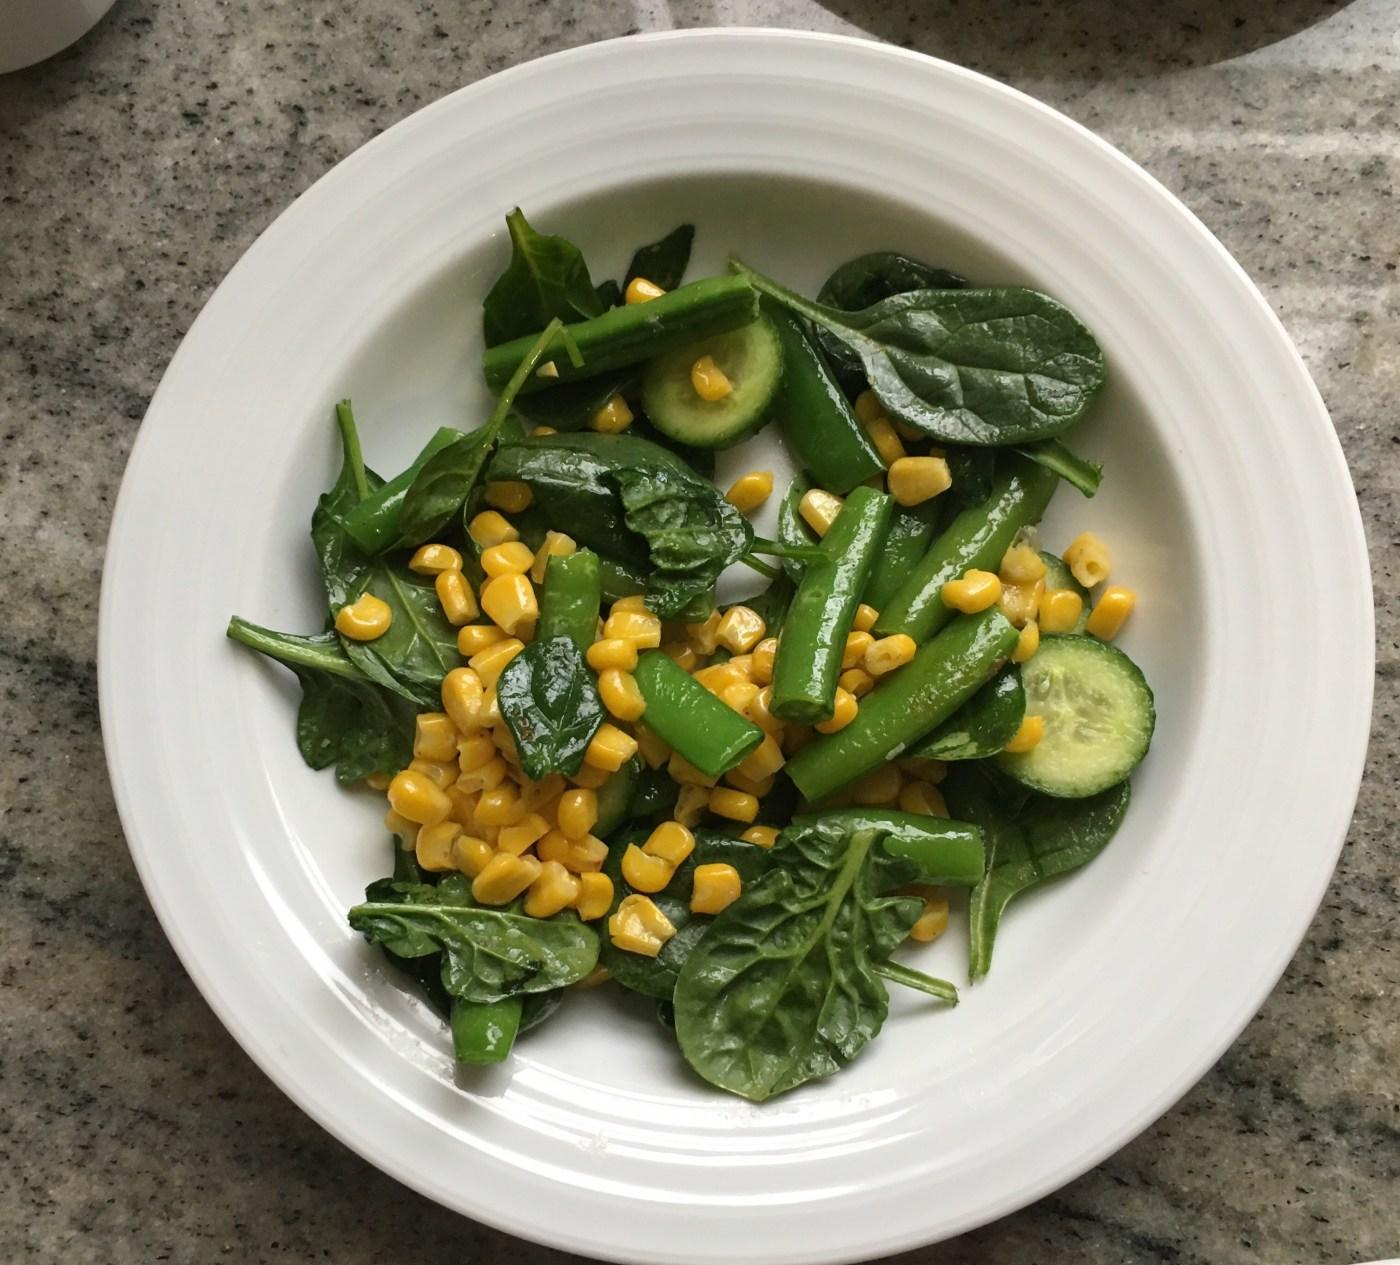 Snap pea, corn, cucumber & spinach salad